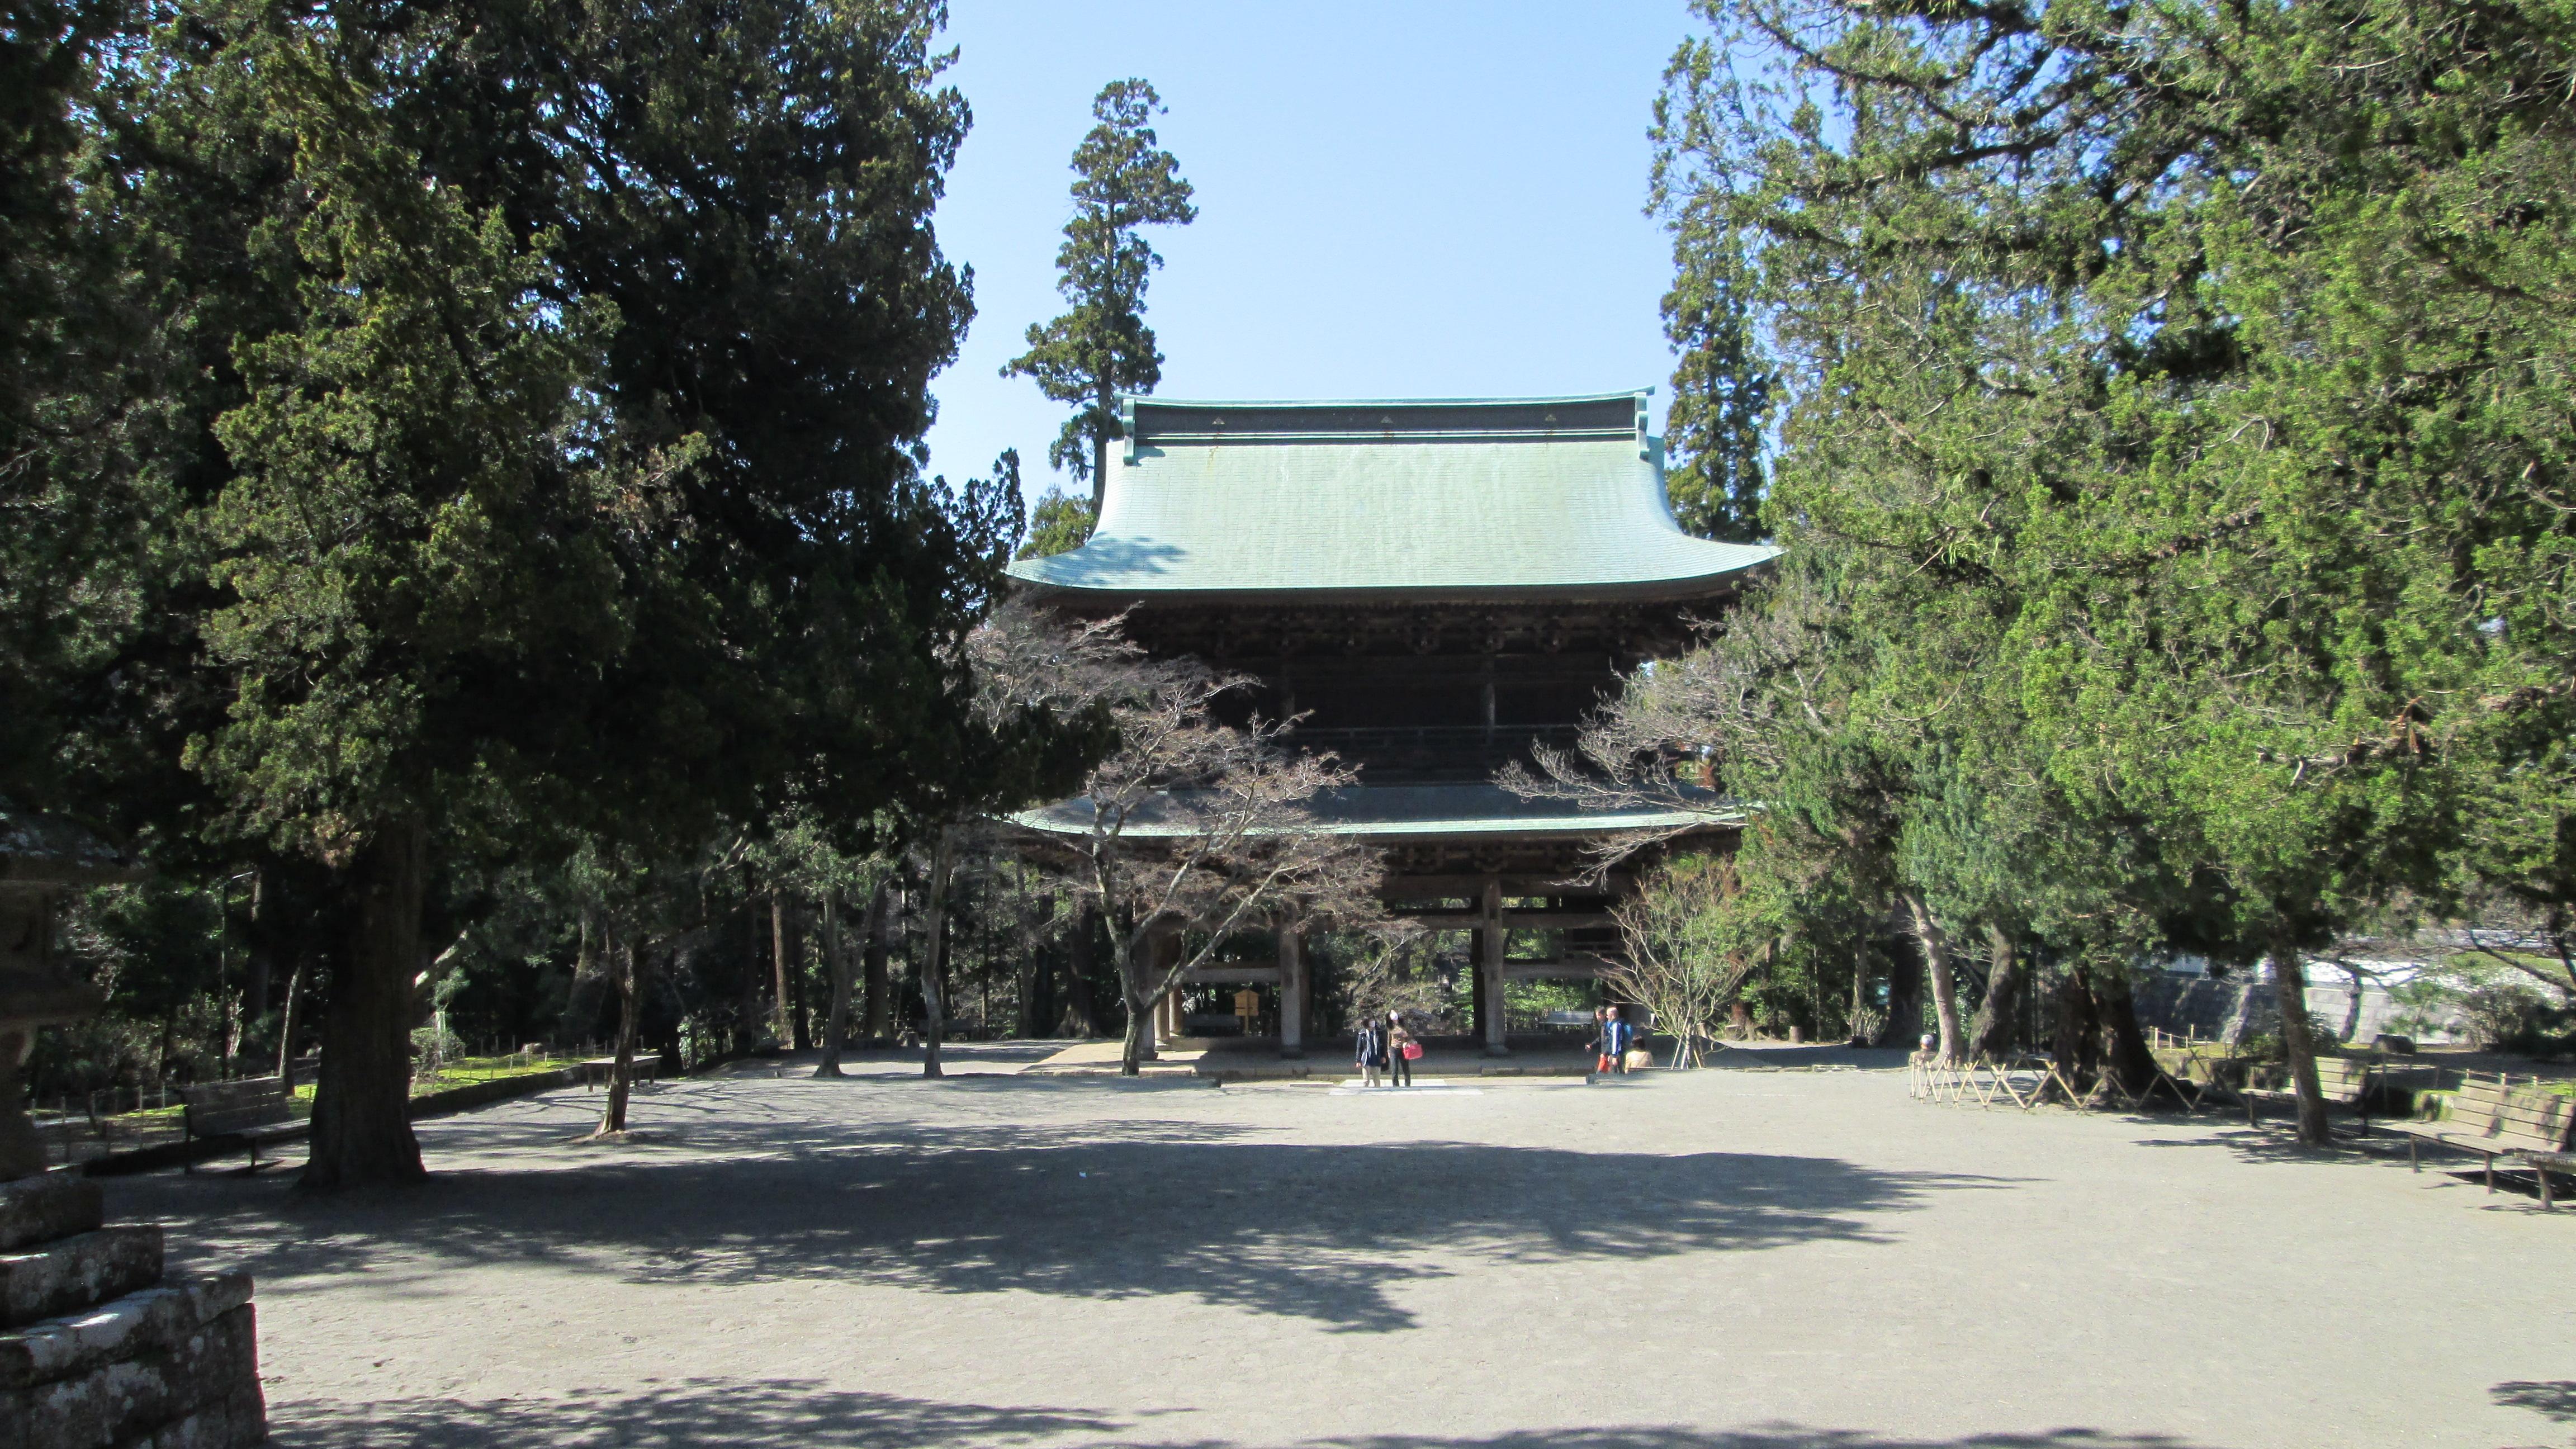 Kamakura Kenchoji